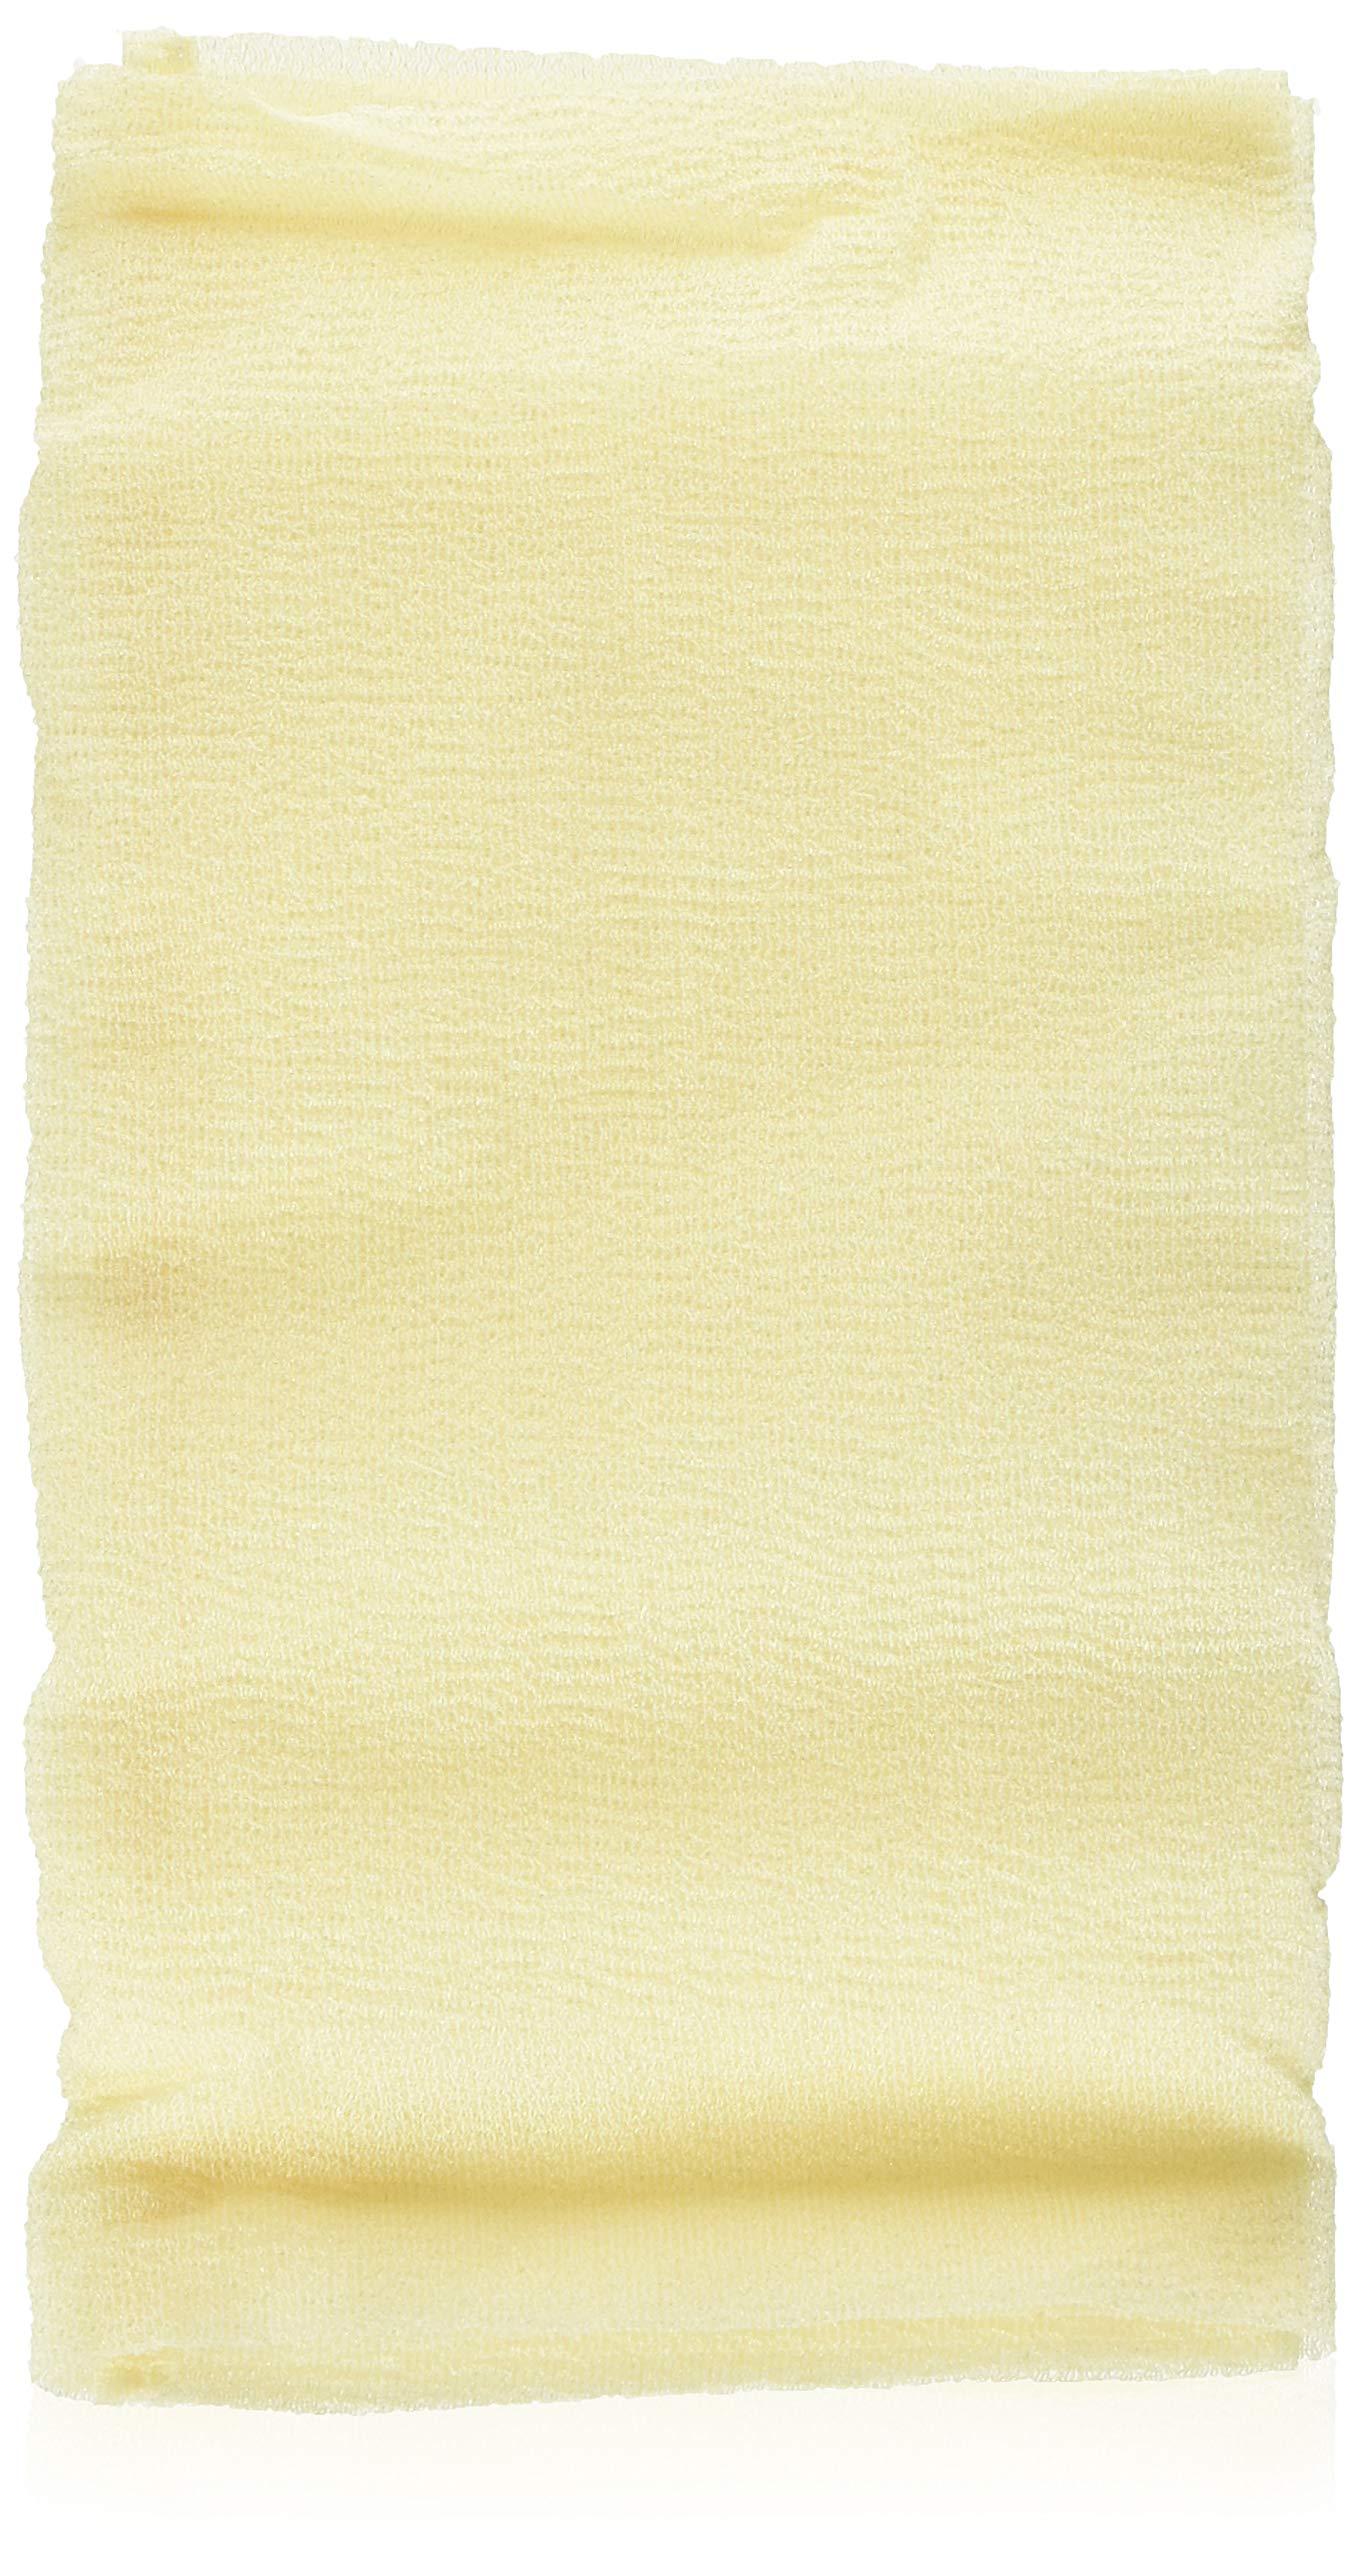 The Body Shop Exfoliating Skin Towel Natural Buy Online In Cook Islands At Cook Desertcart Com Productid 5455950